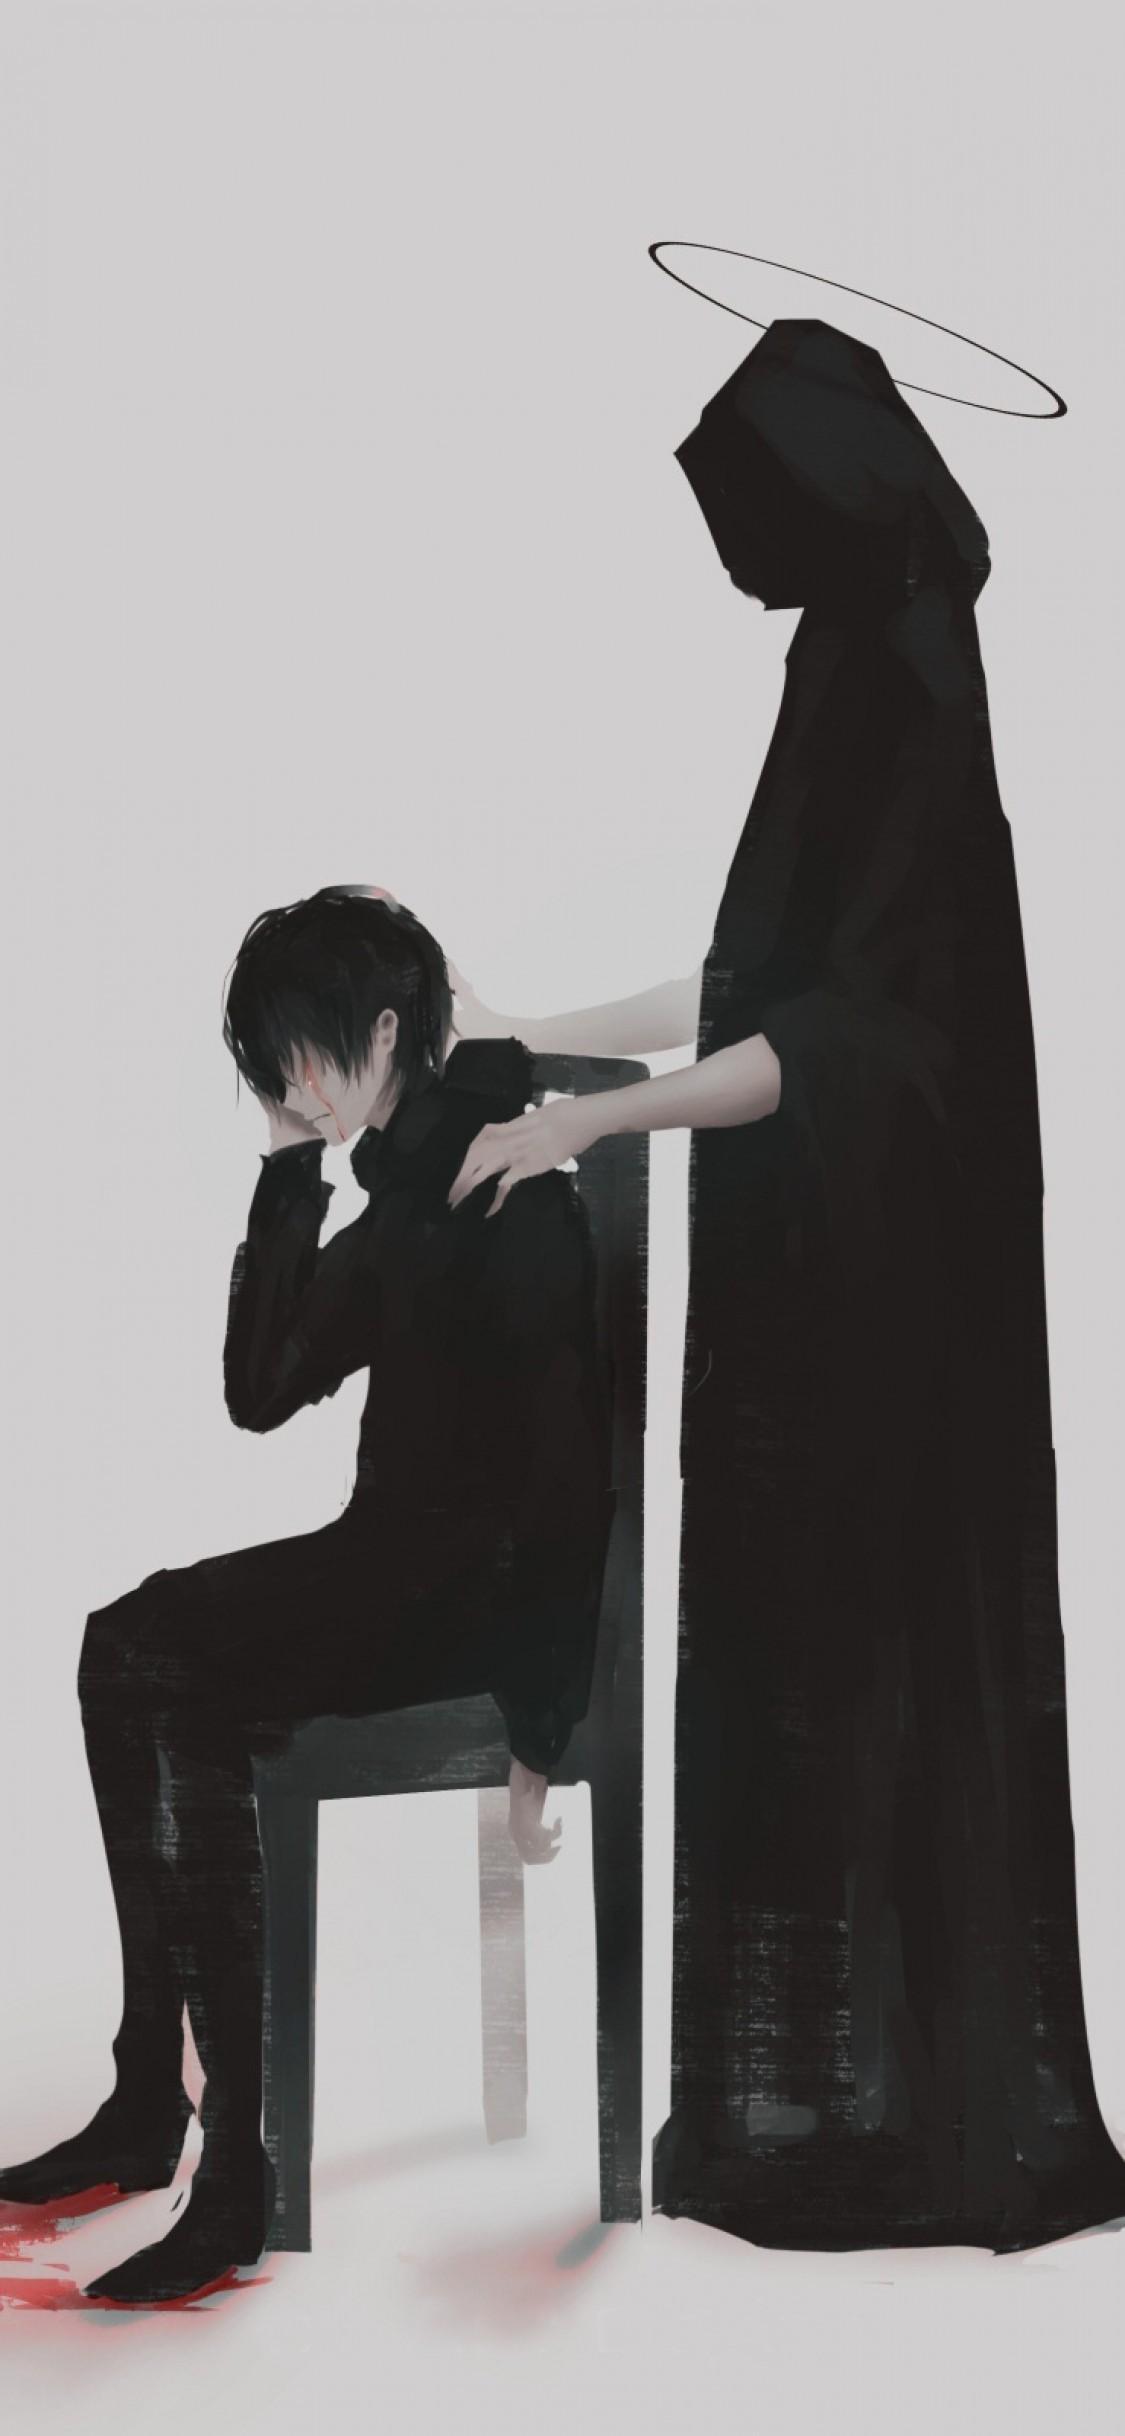 Dark Sad Anime Boy Wallpapers Wallpaper Cave